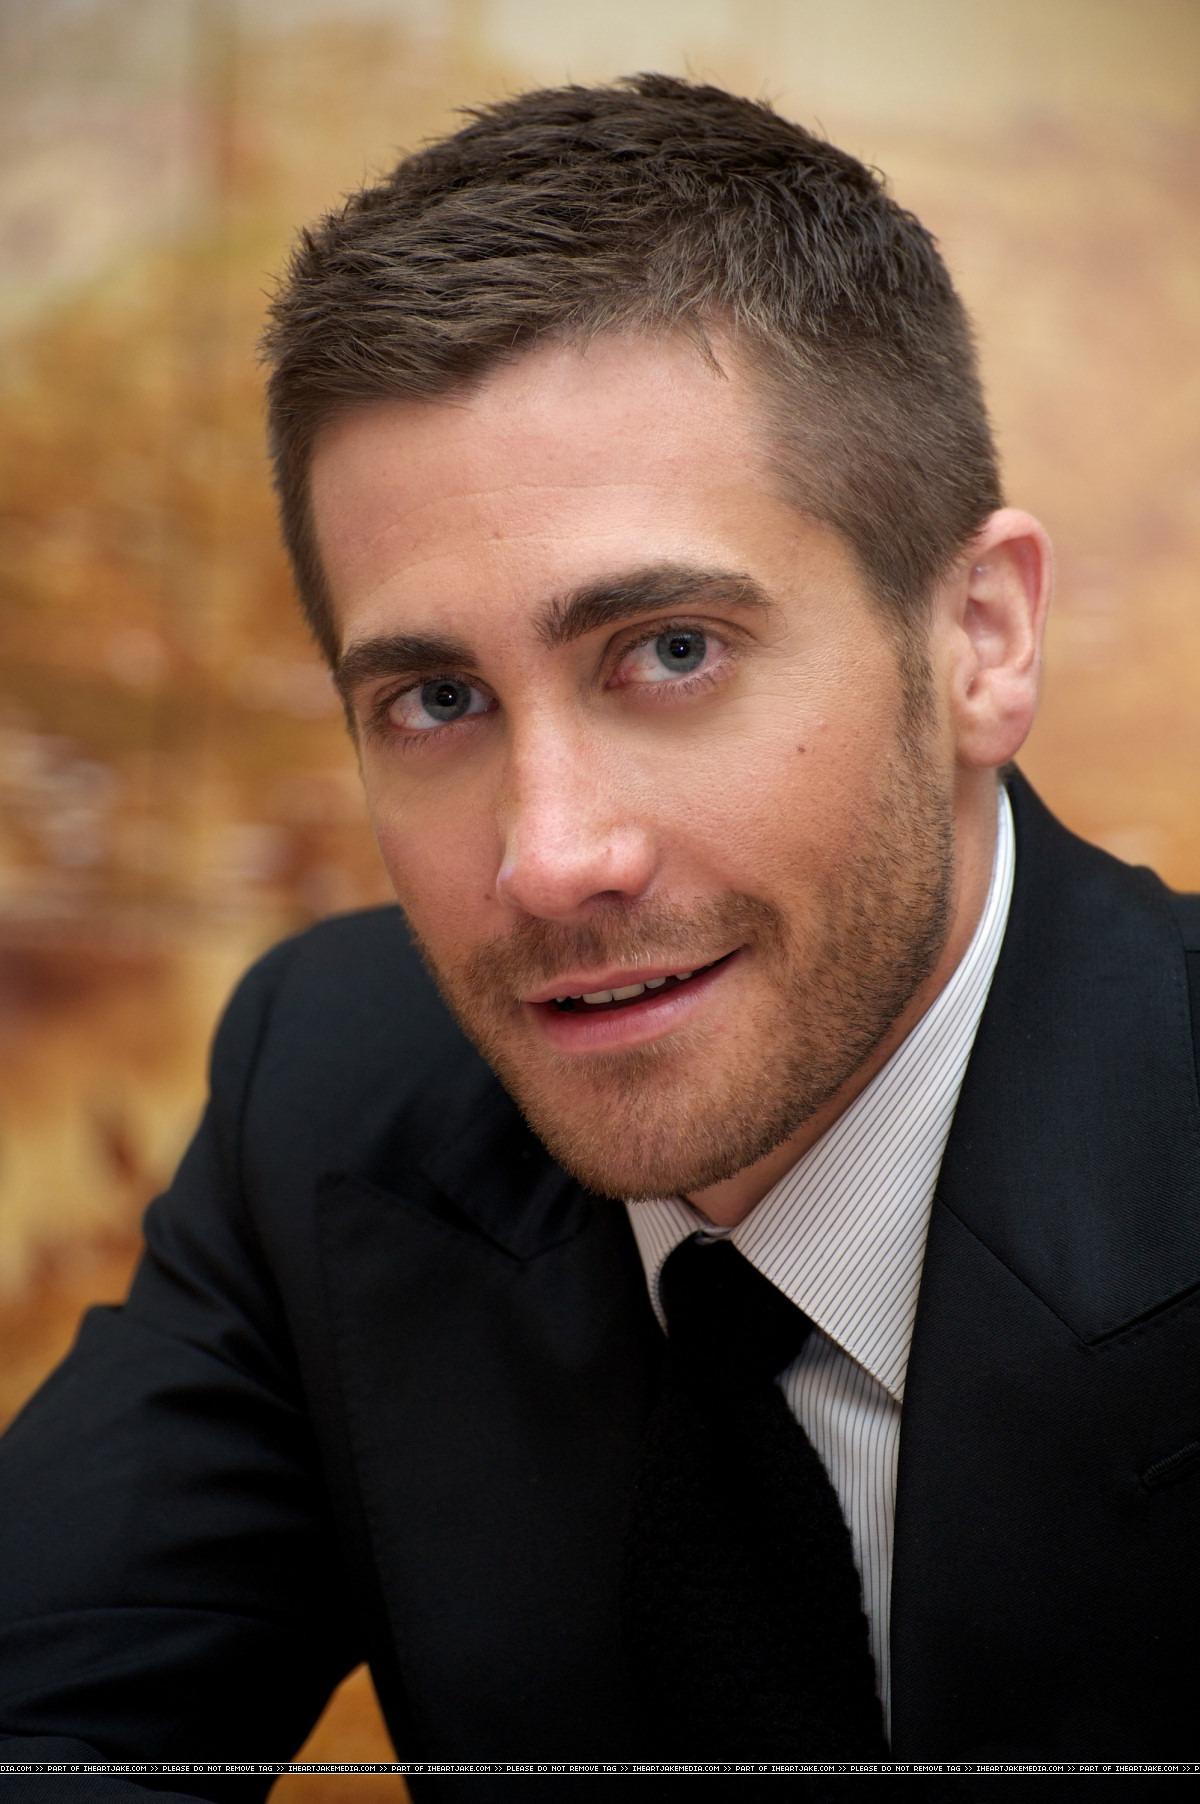 Jake Gyllenhaal: Photo